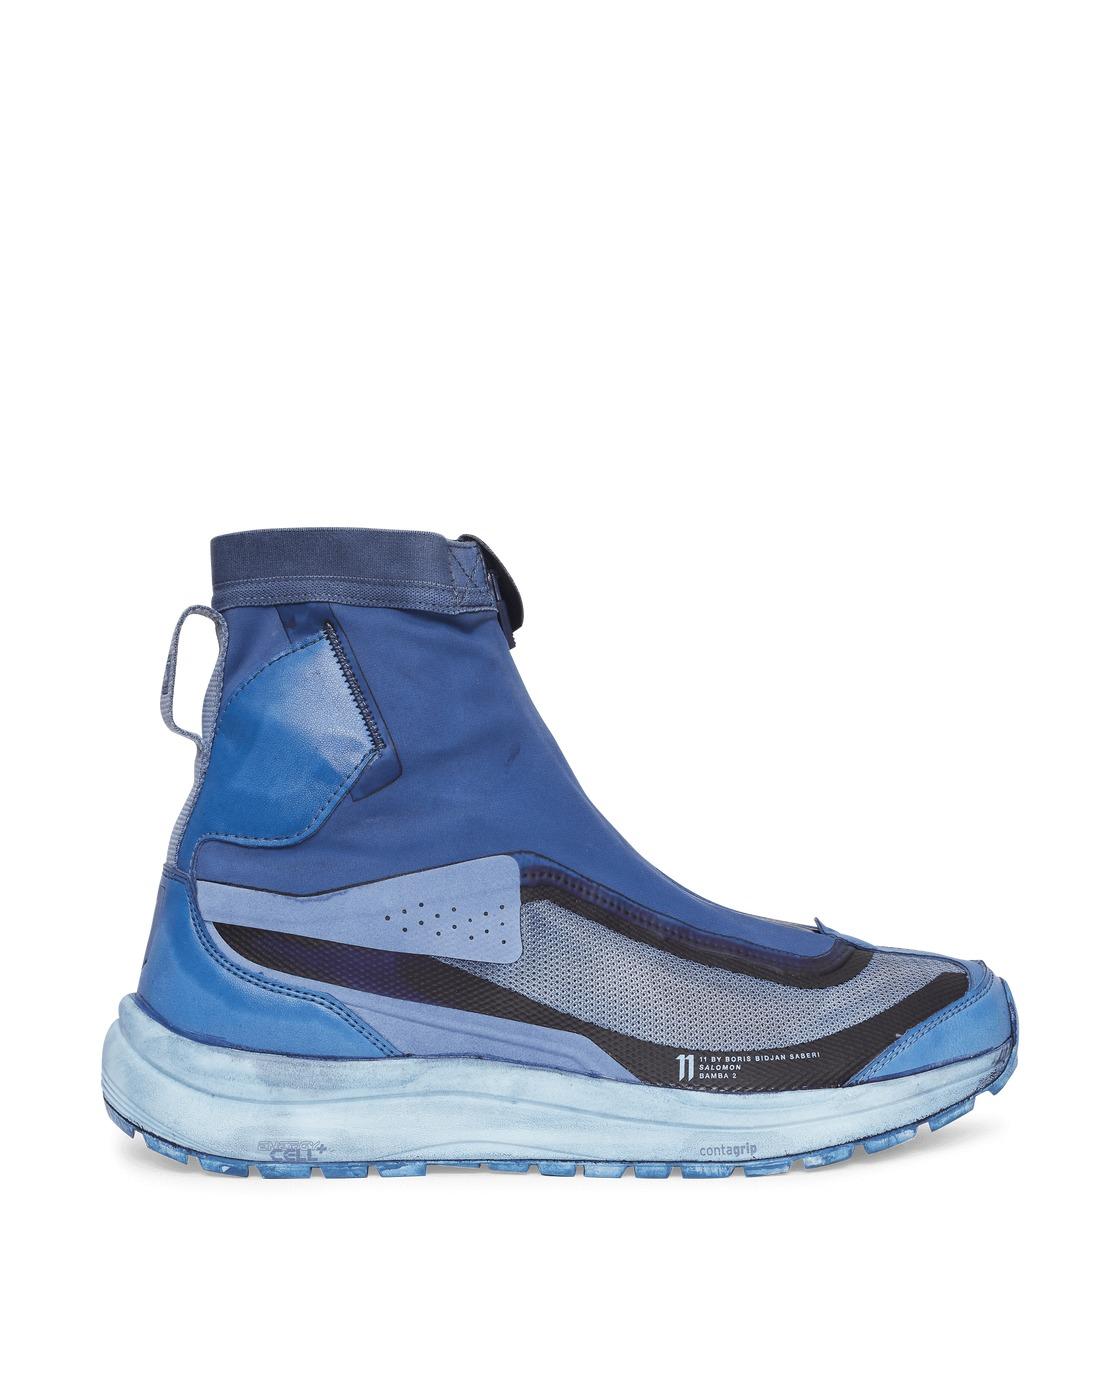 Photo: Salomon Boris Bidjan Saberi Bamba 2 High Sneakers Synth Blue